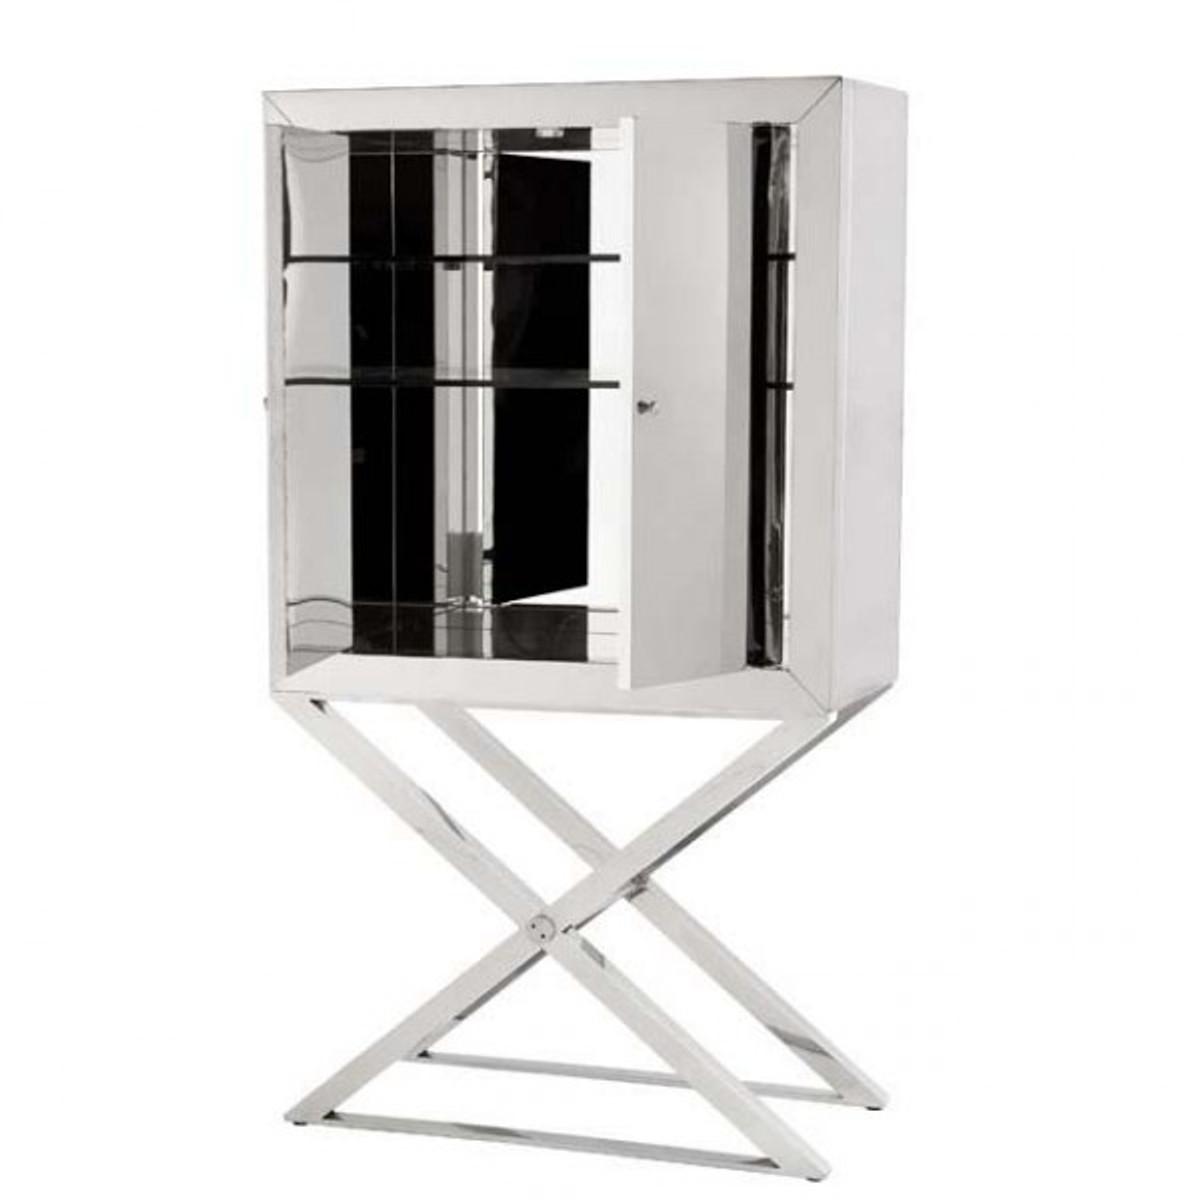 casa padrino luxus designer barschrank edelstahl. Black Bedroom Furniture Sets. Home Design Ideas